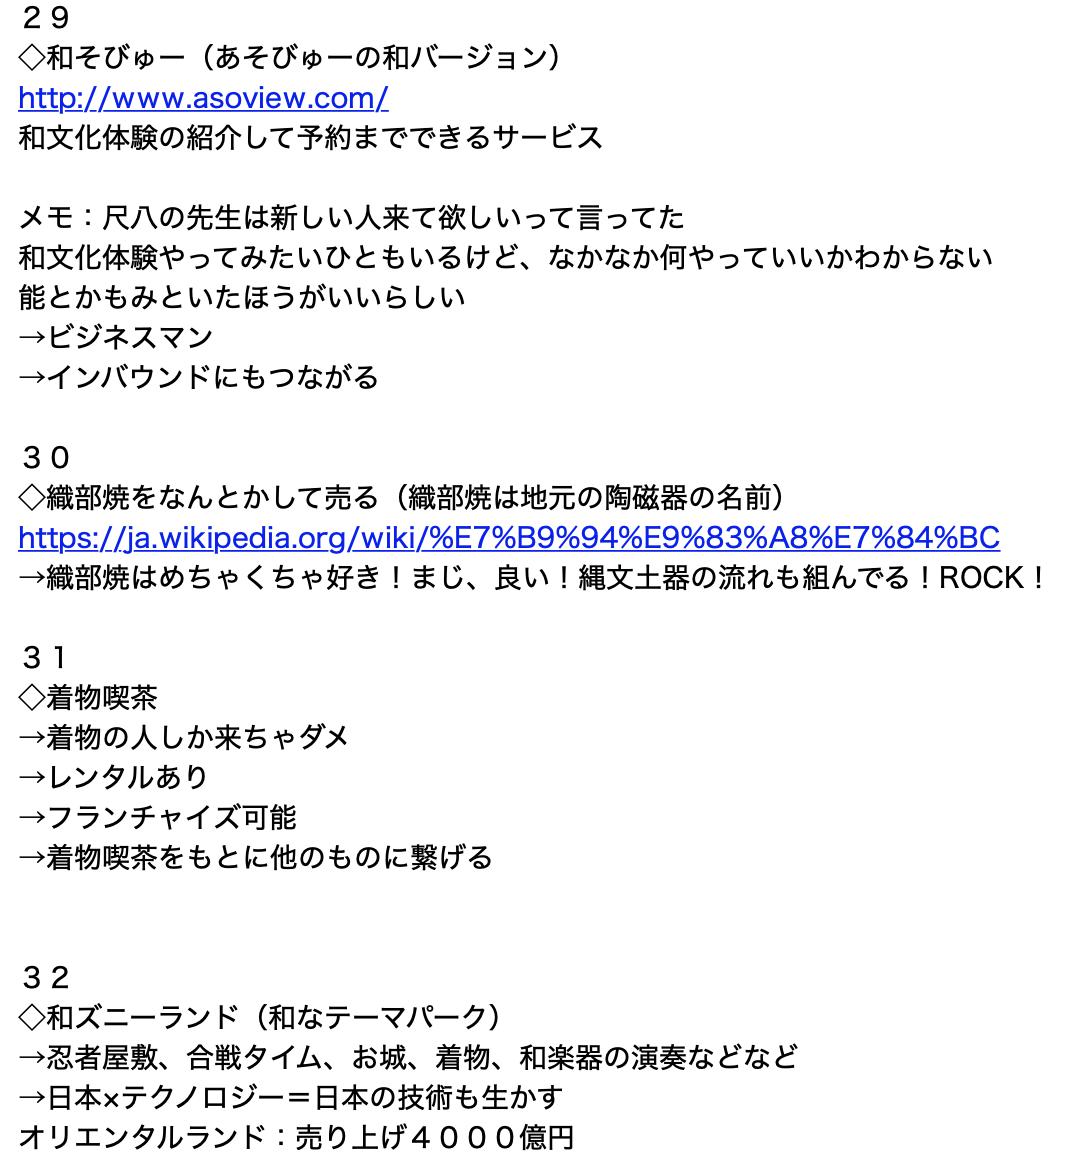 f:id:samurairyo:20190430135348p:plain